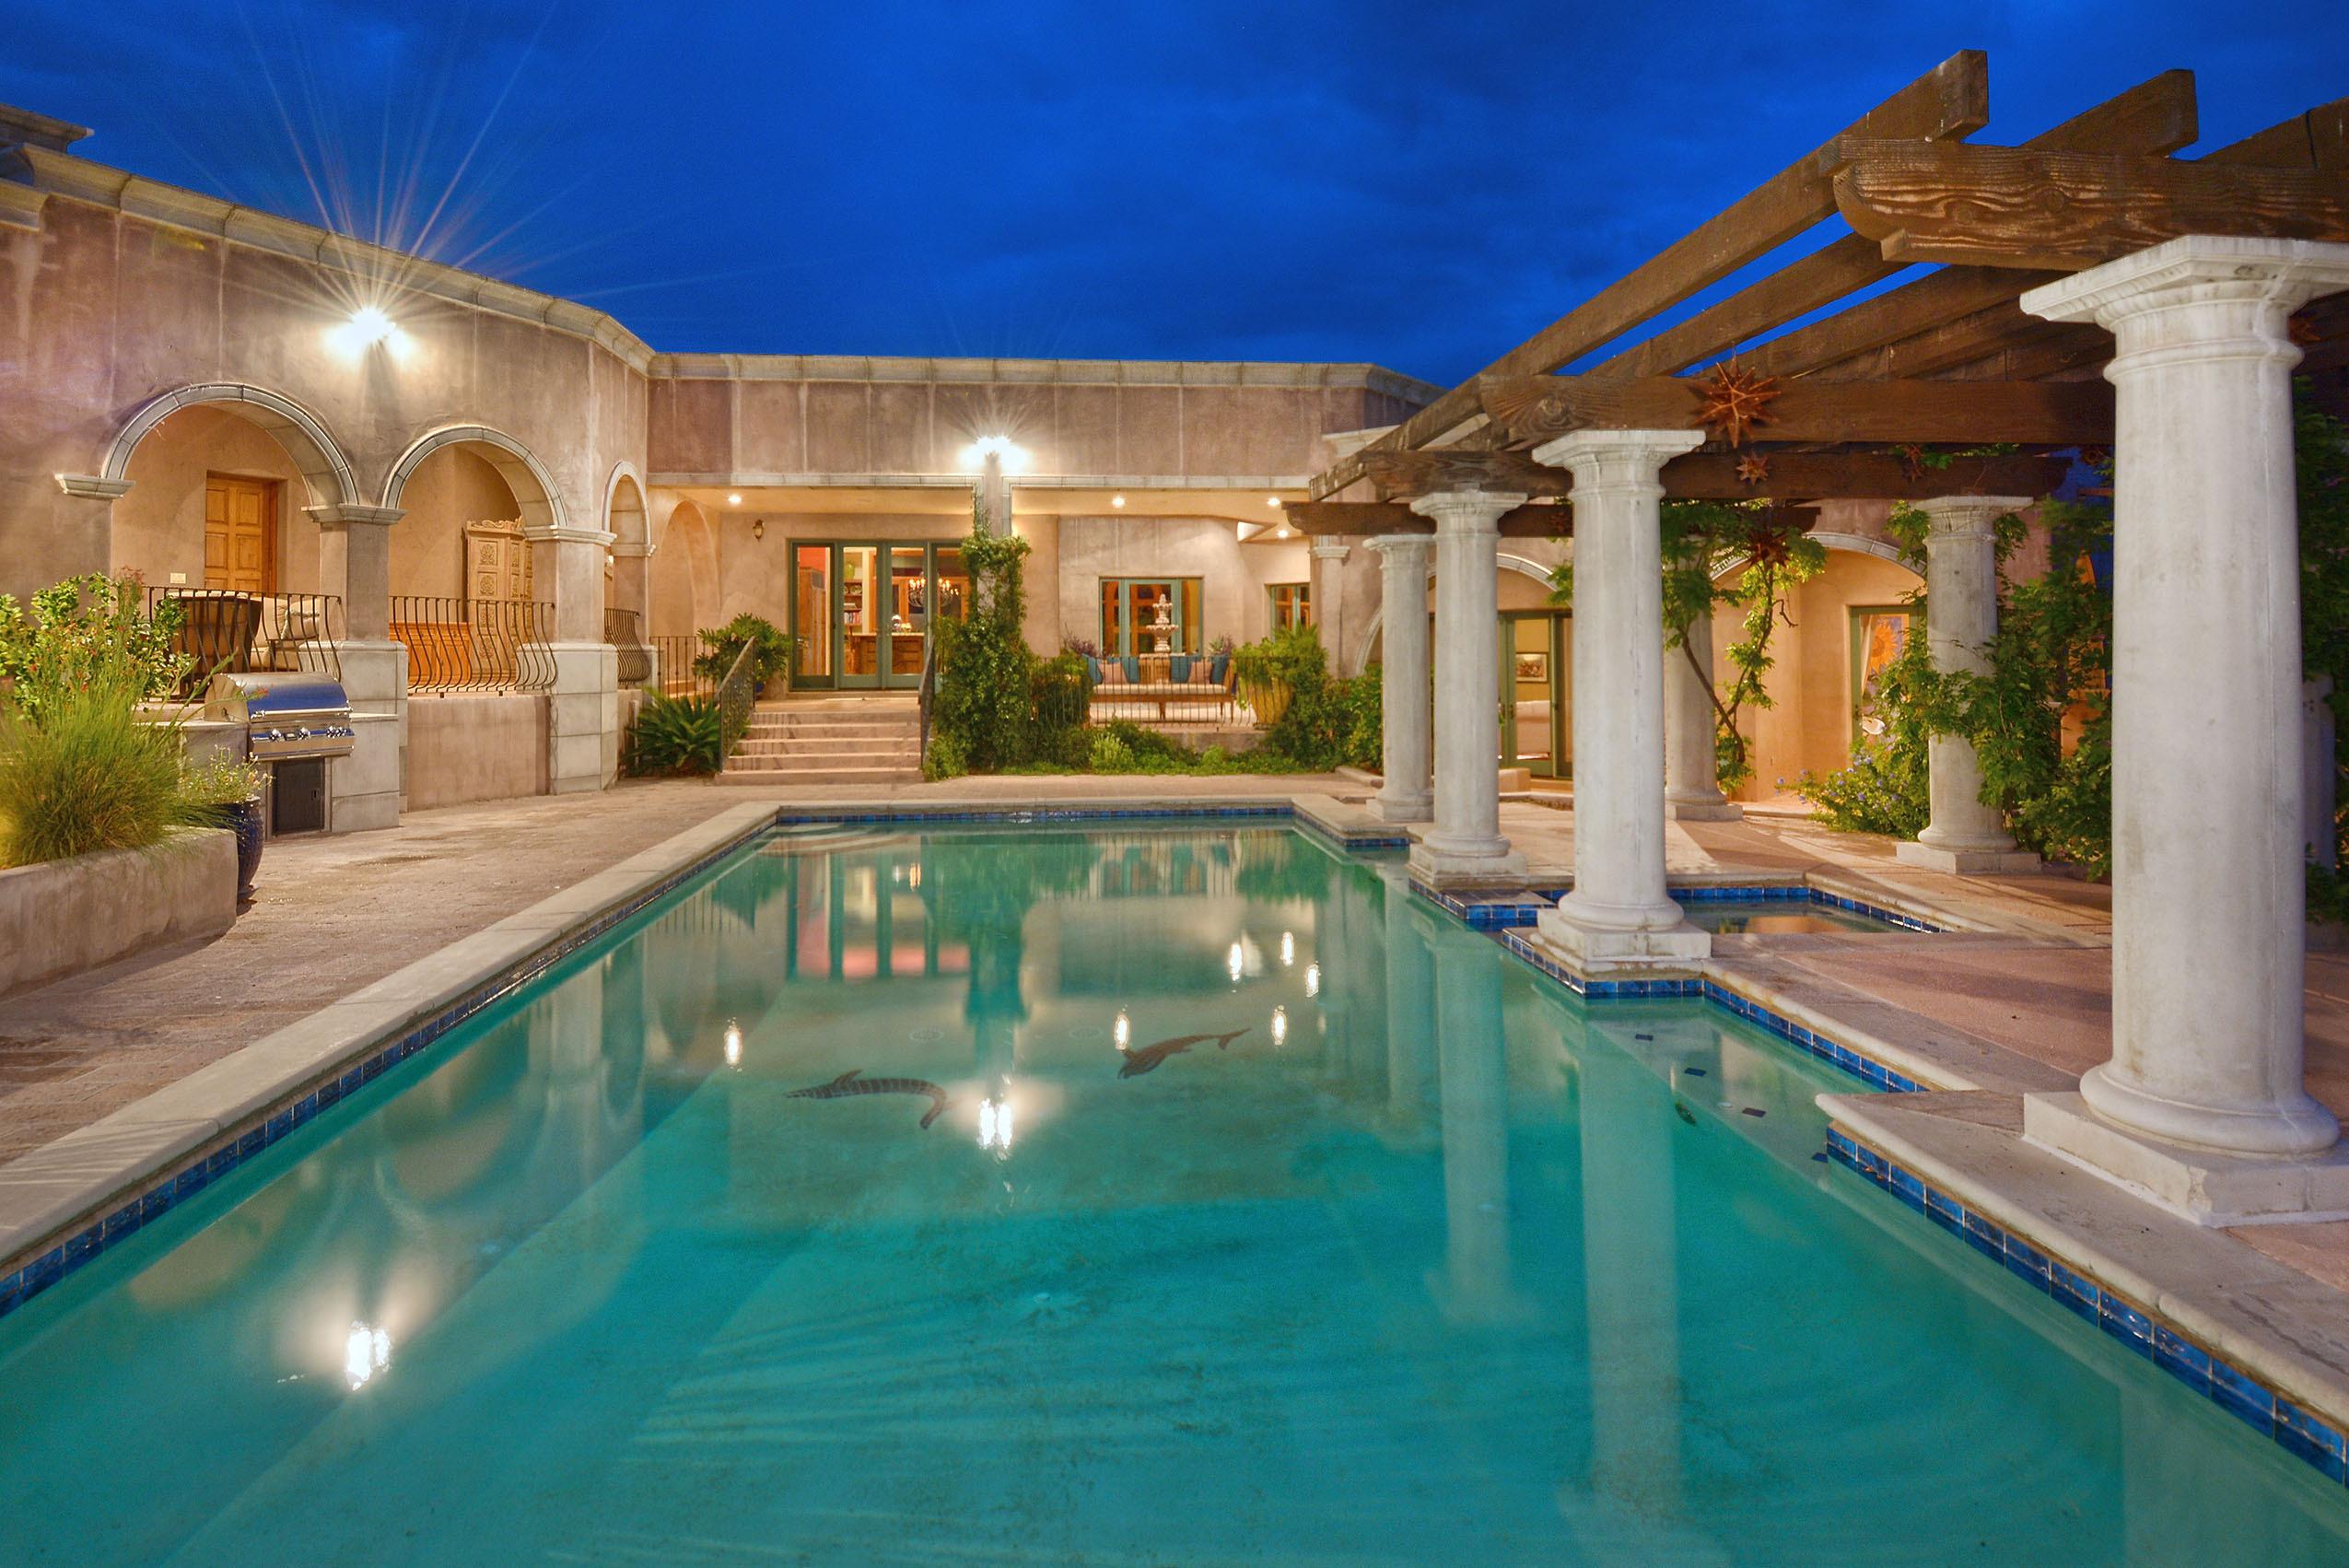 New Listing La Paloma Estates Tucson Az 4 5 4 678 Sq F